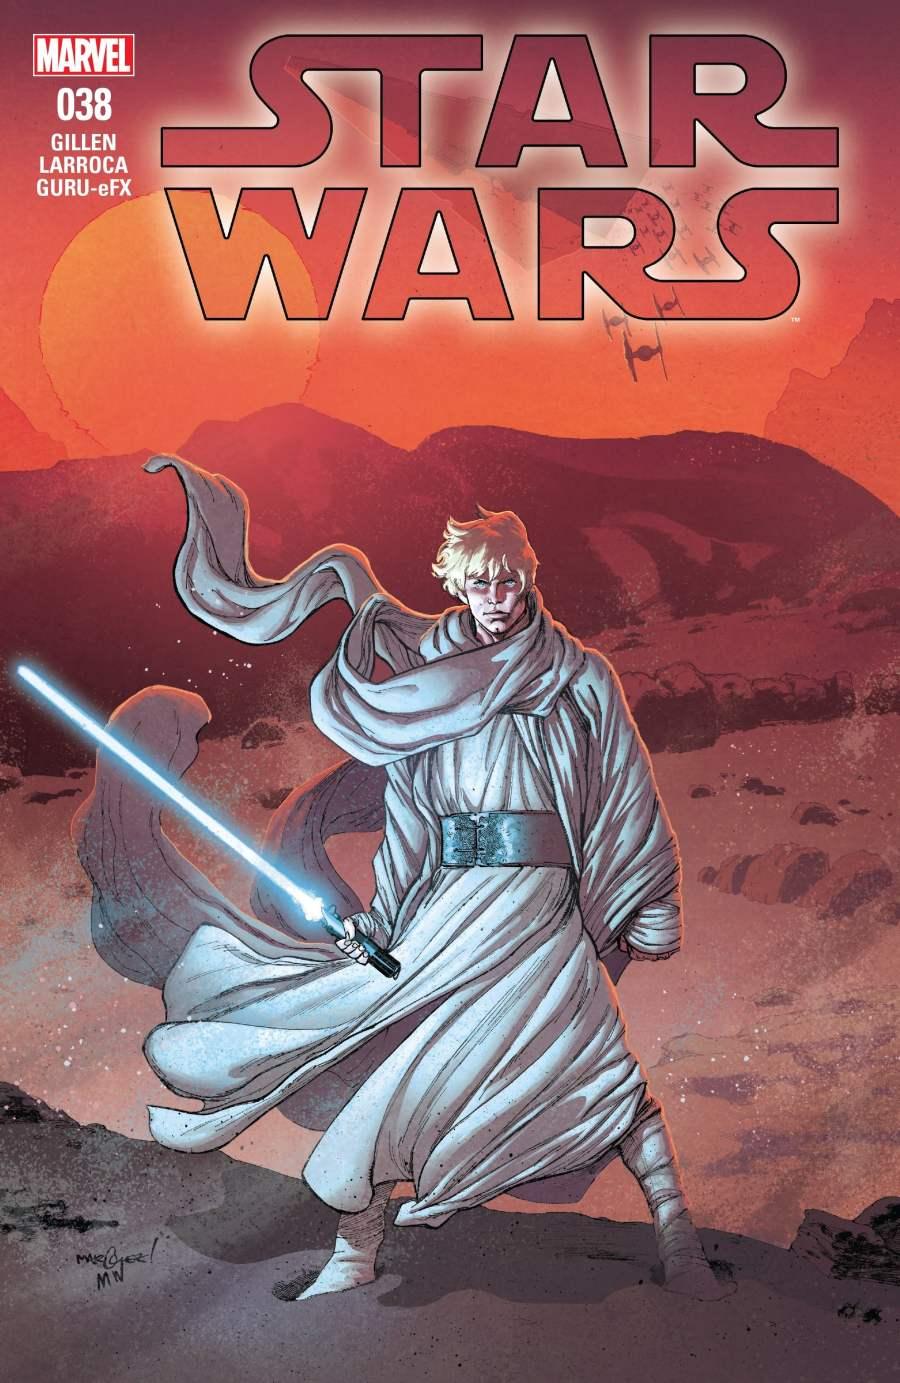 Star-Wars-038-Cover.jpg